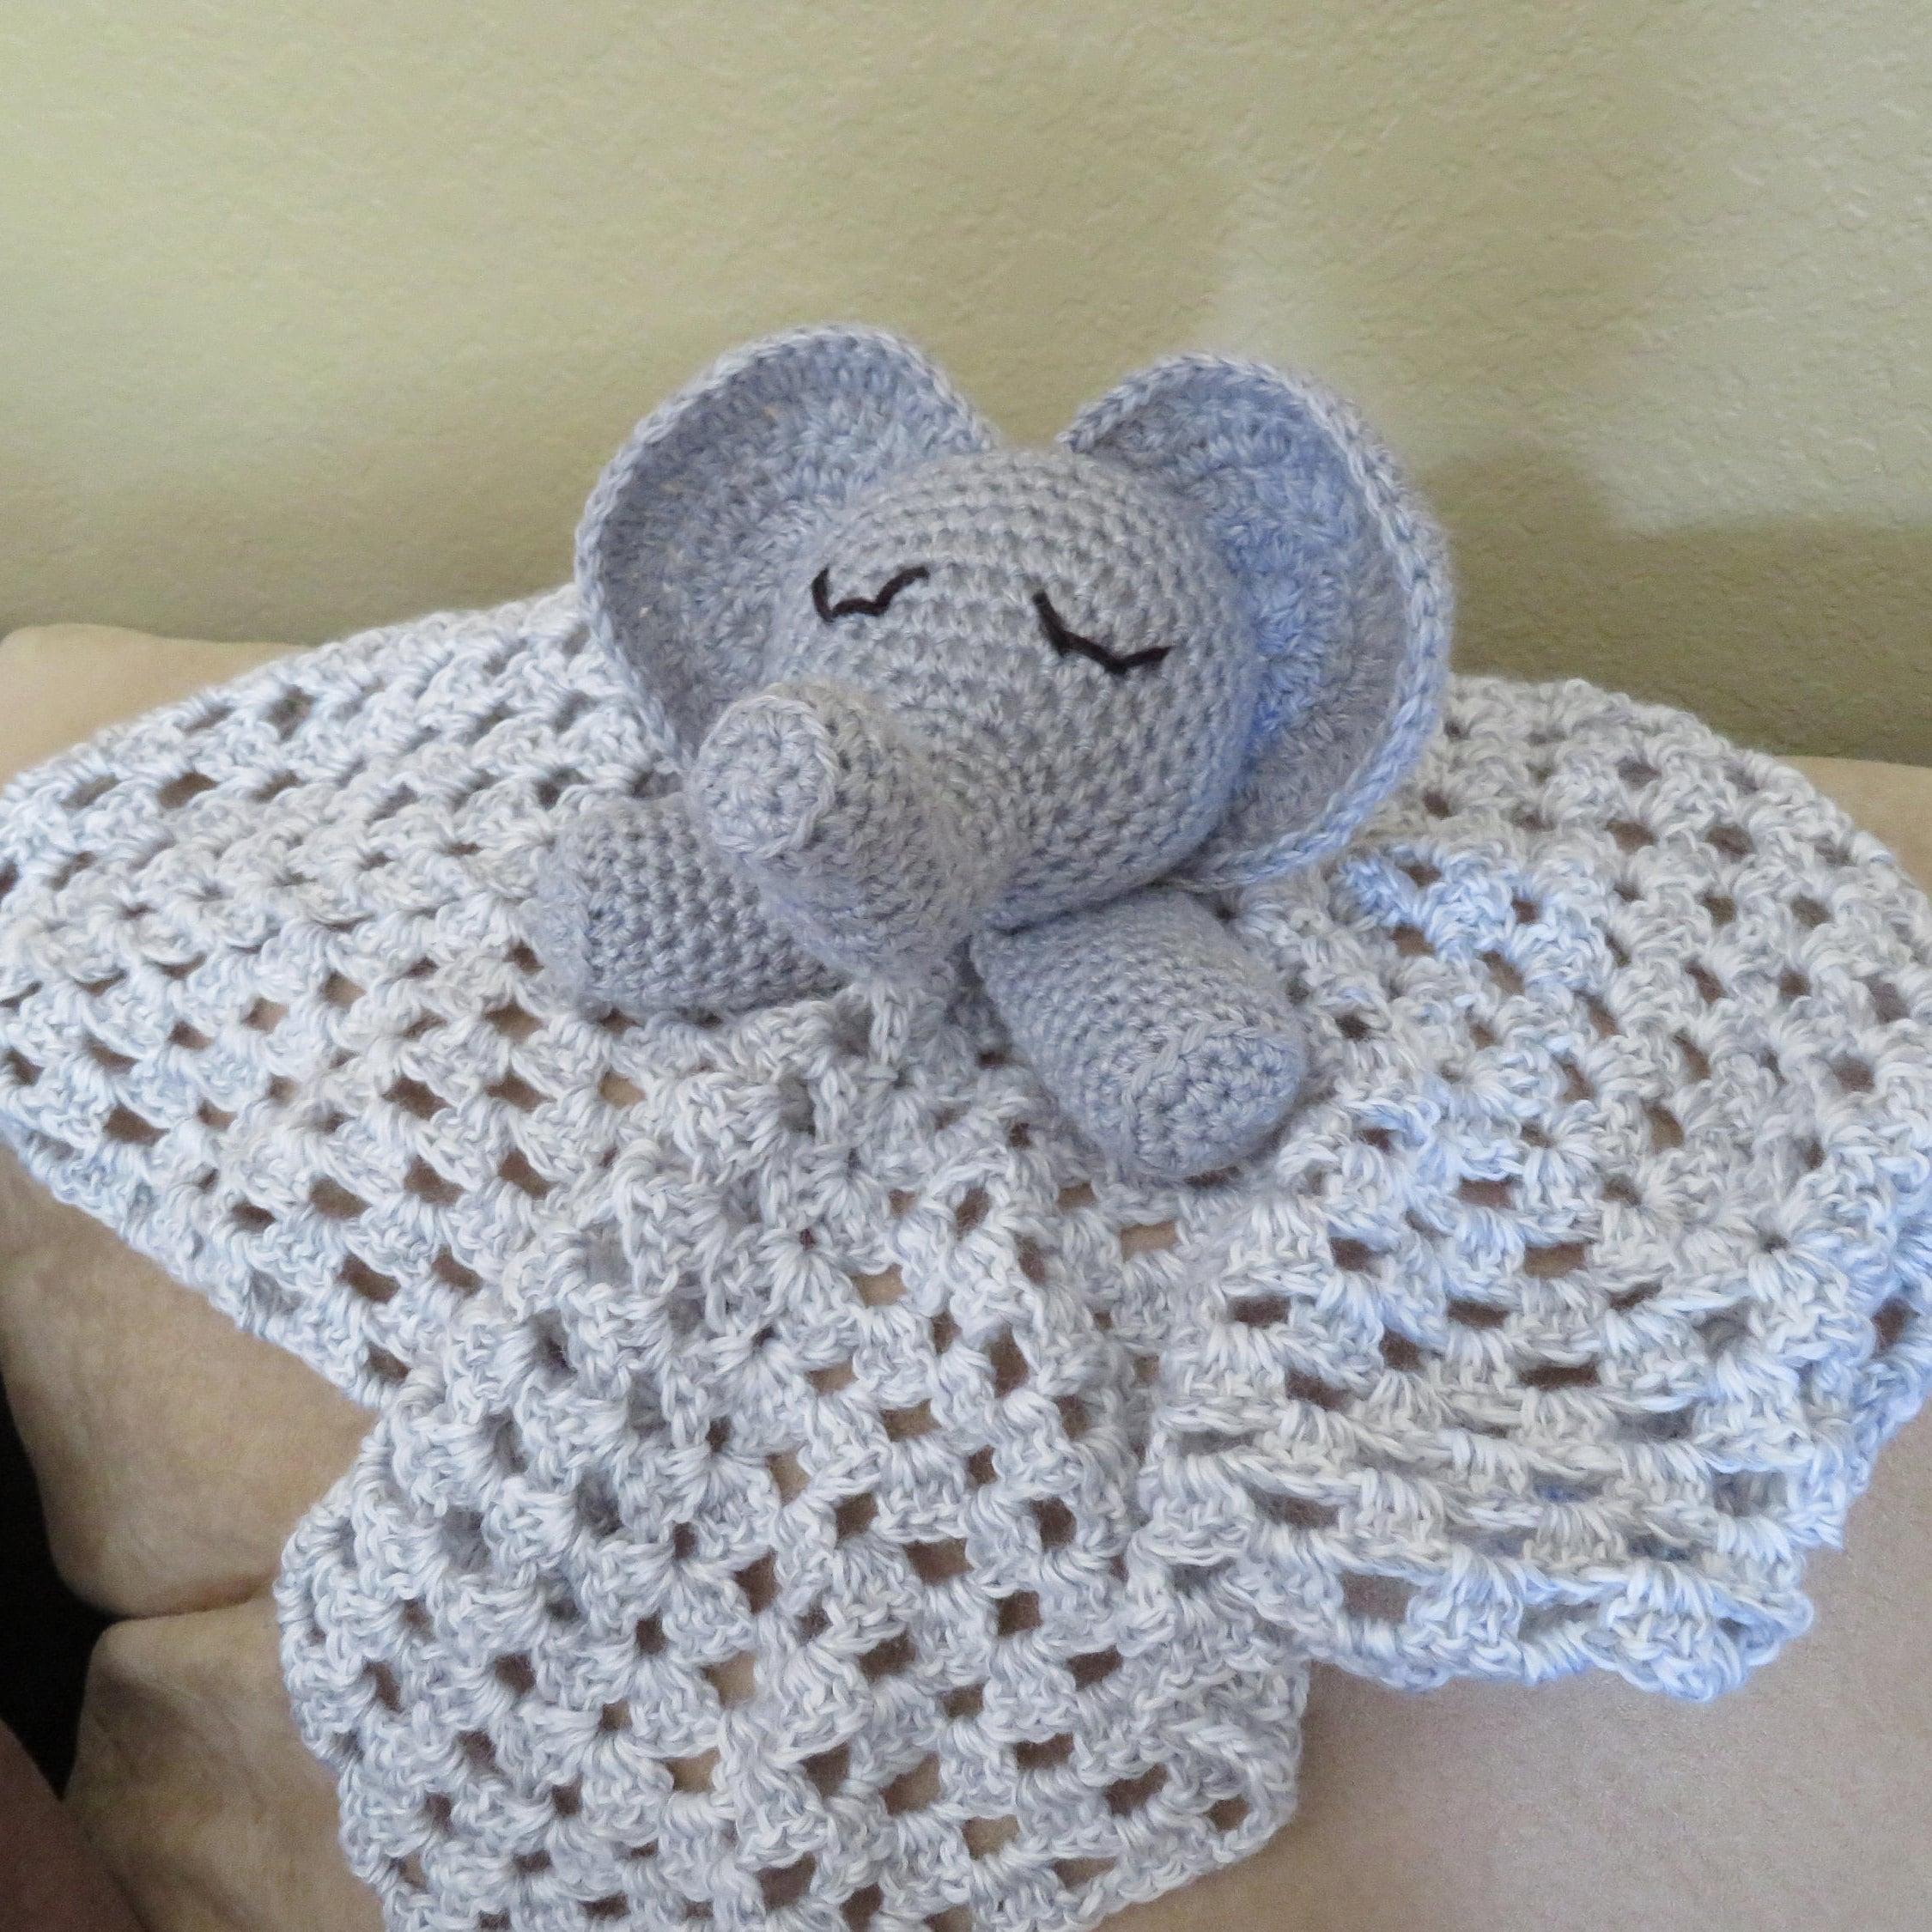 Elephant Blanket Crochet Pattern Lovey Elephant Amigurumi Etsy